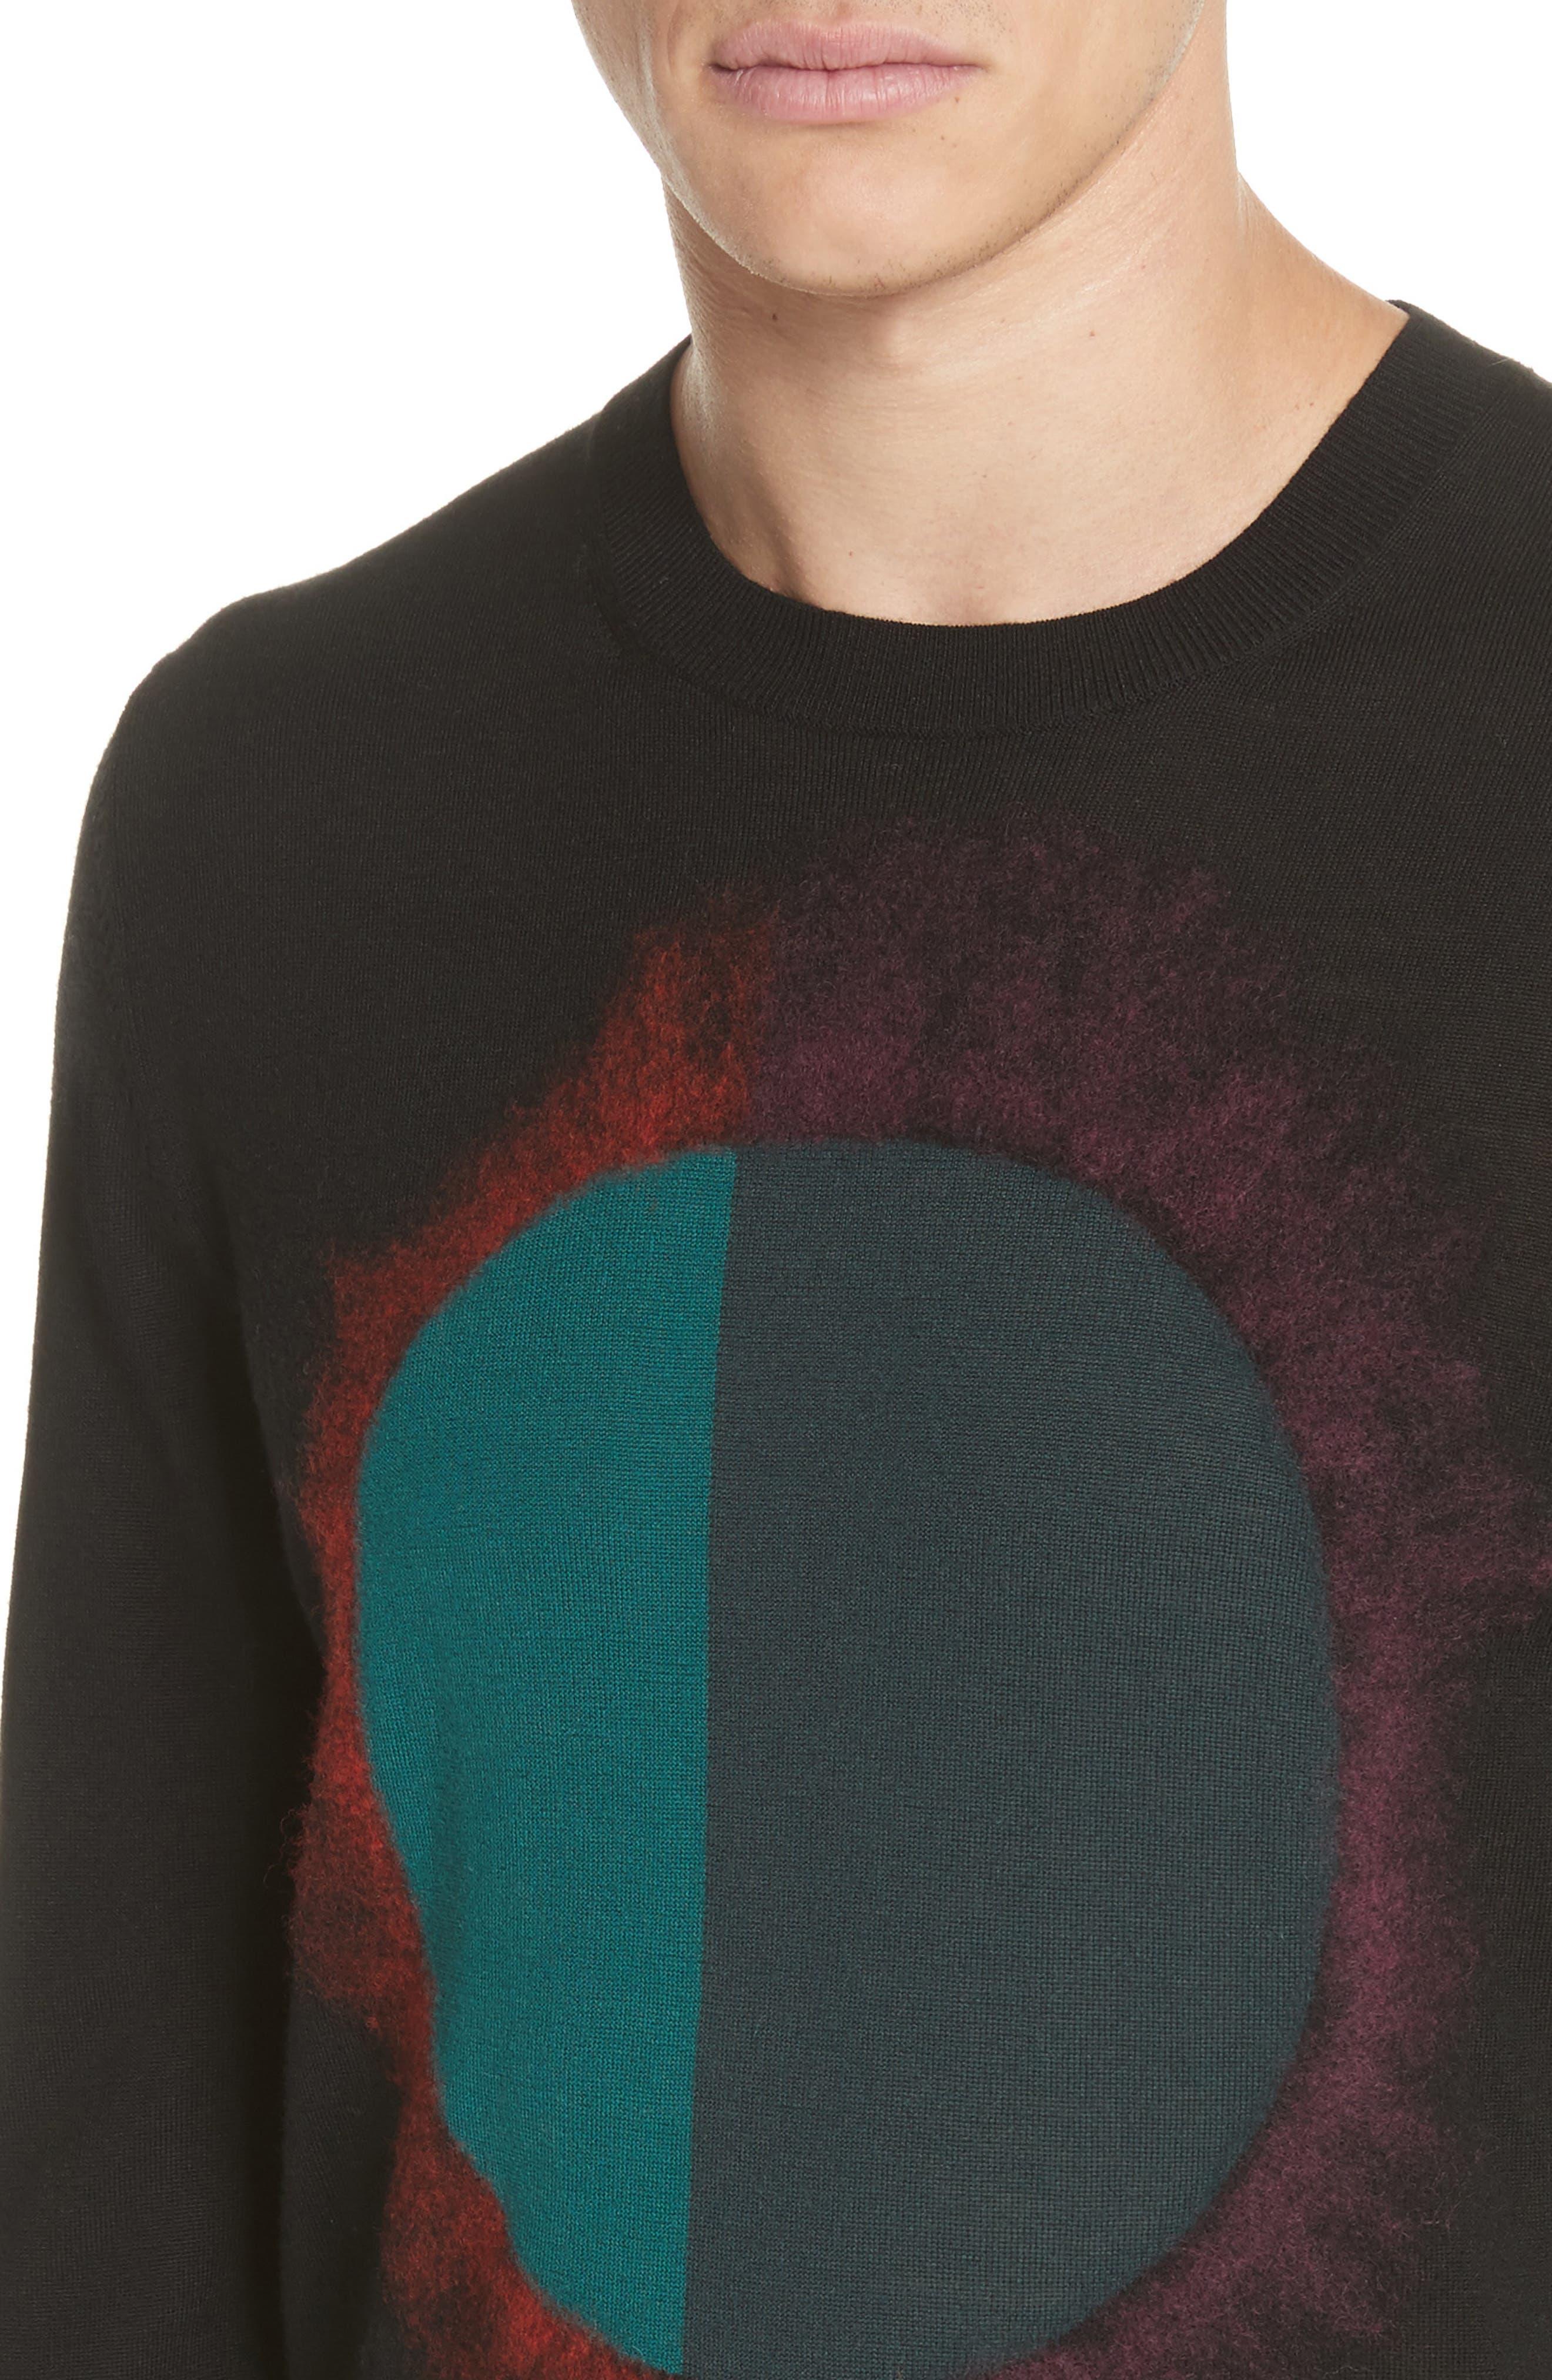 Circle Merino Wool Blend Sweater,                             Alternate thumbnail 4, color,                             001